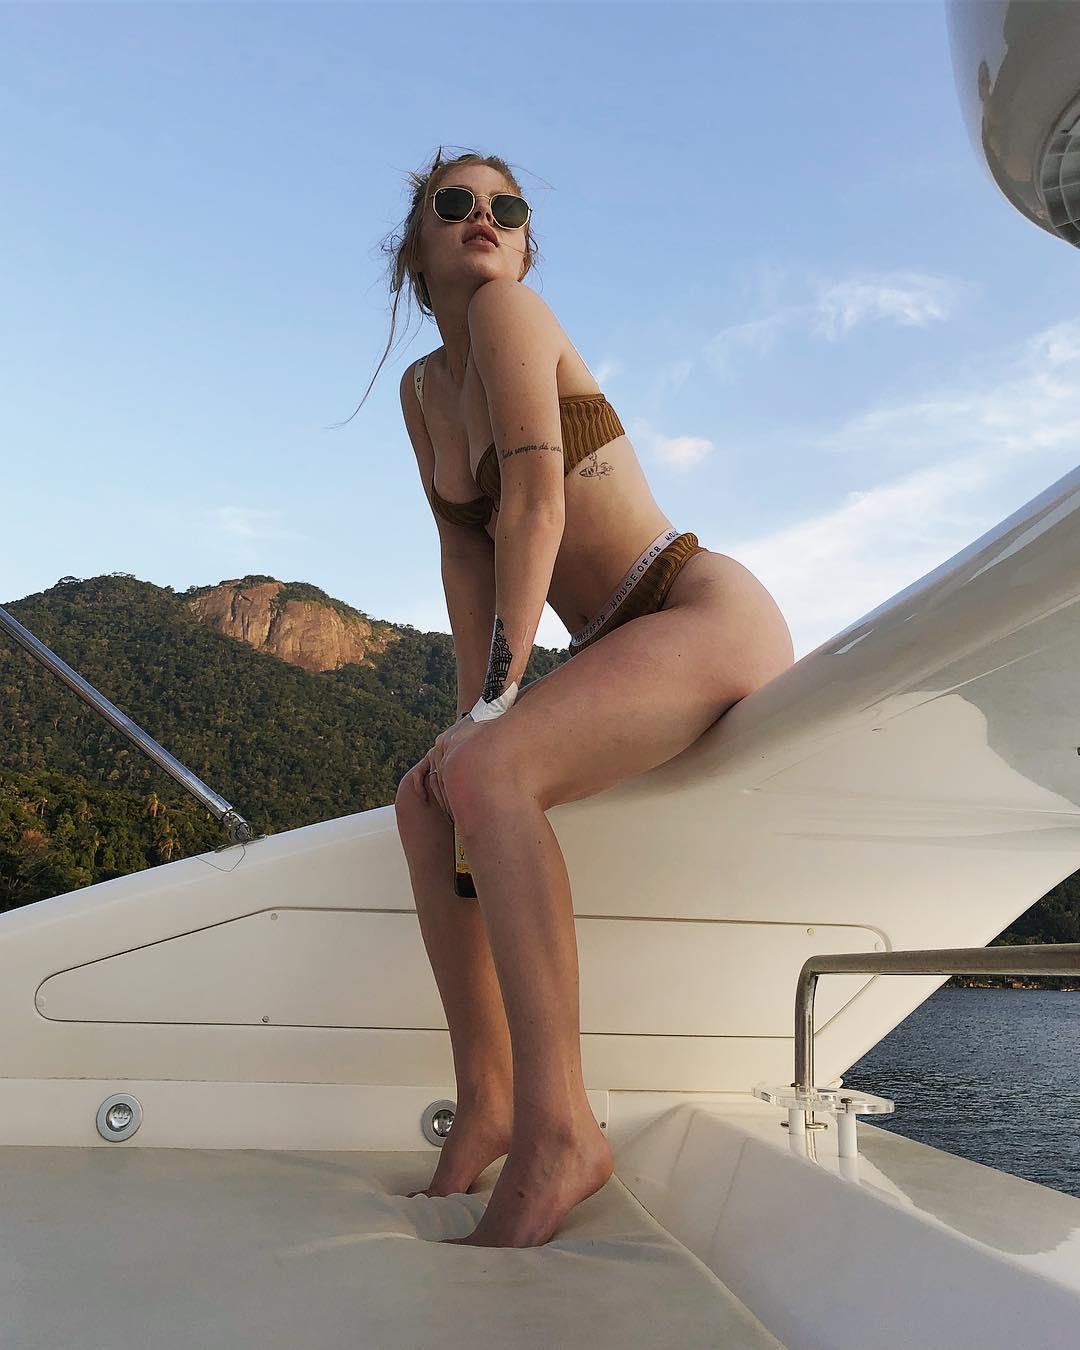 As fotos mais sexy de Luísa Sonza no Instagram 54